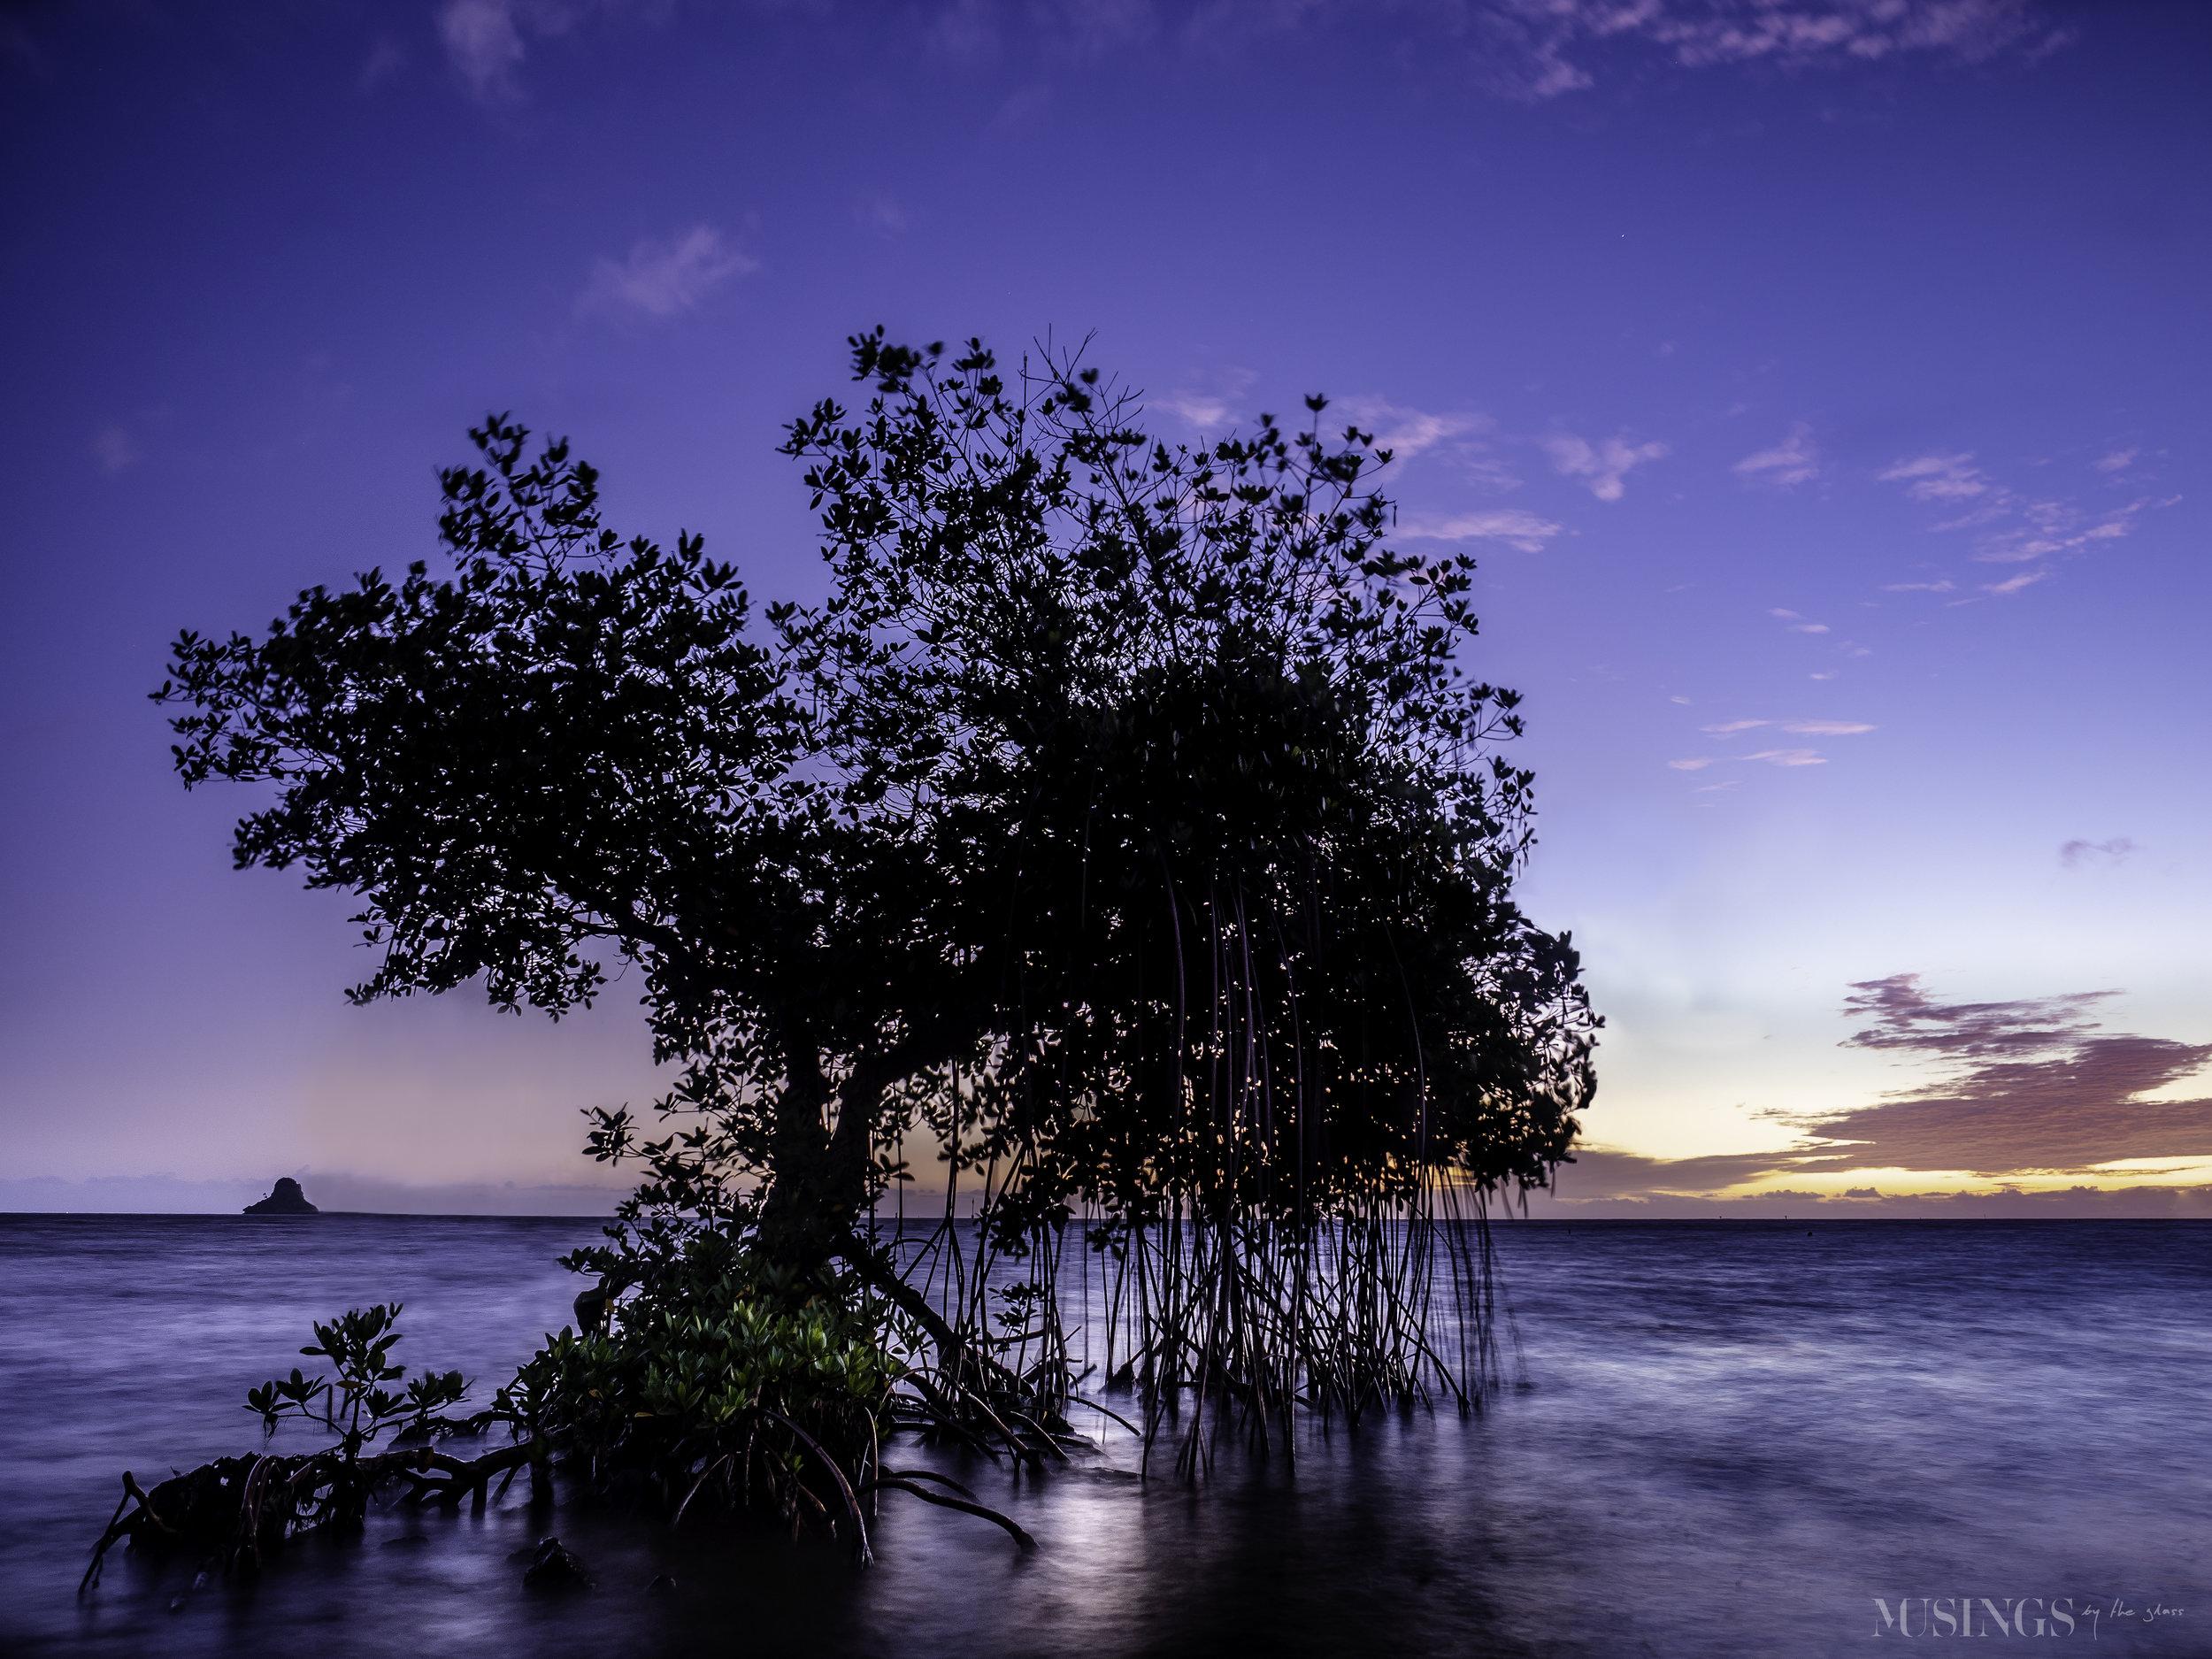 Floating Mangrove